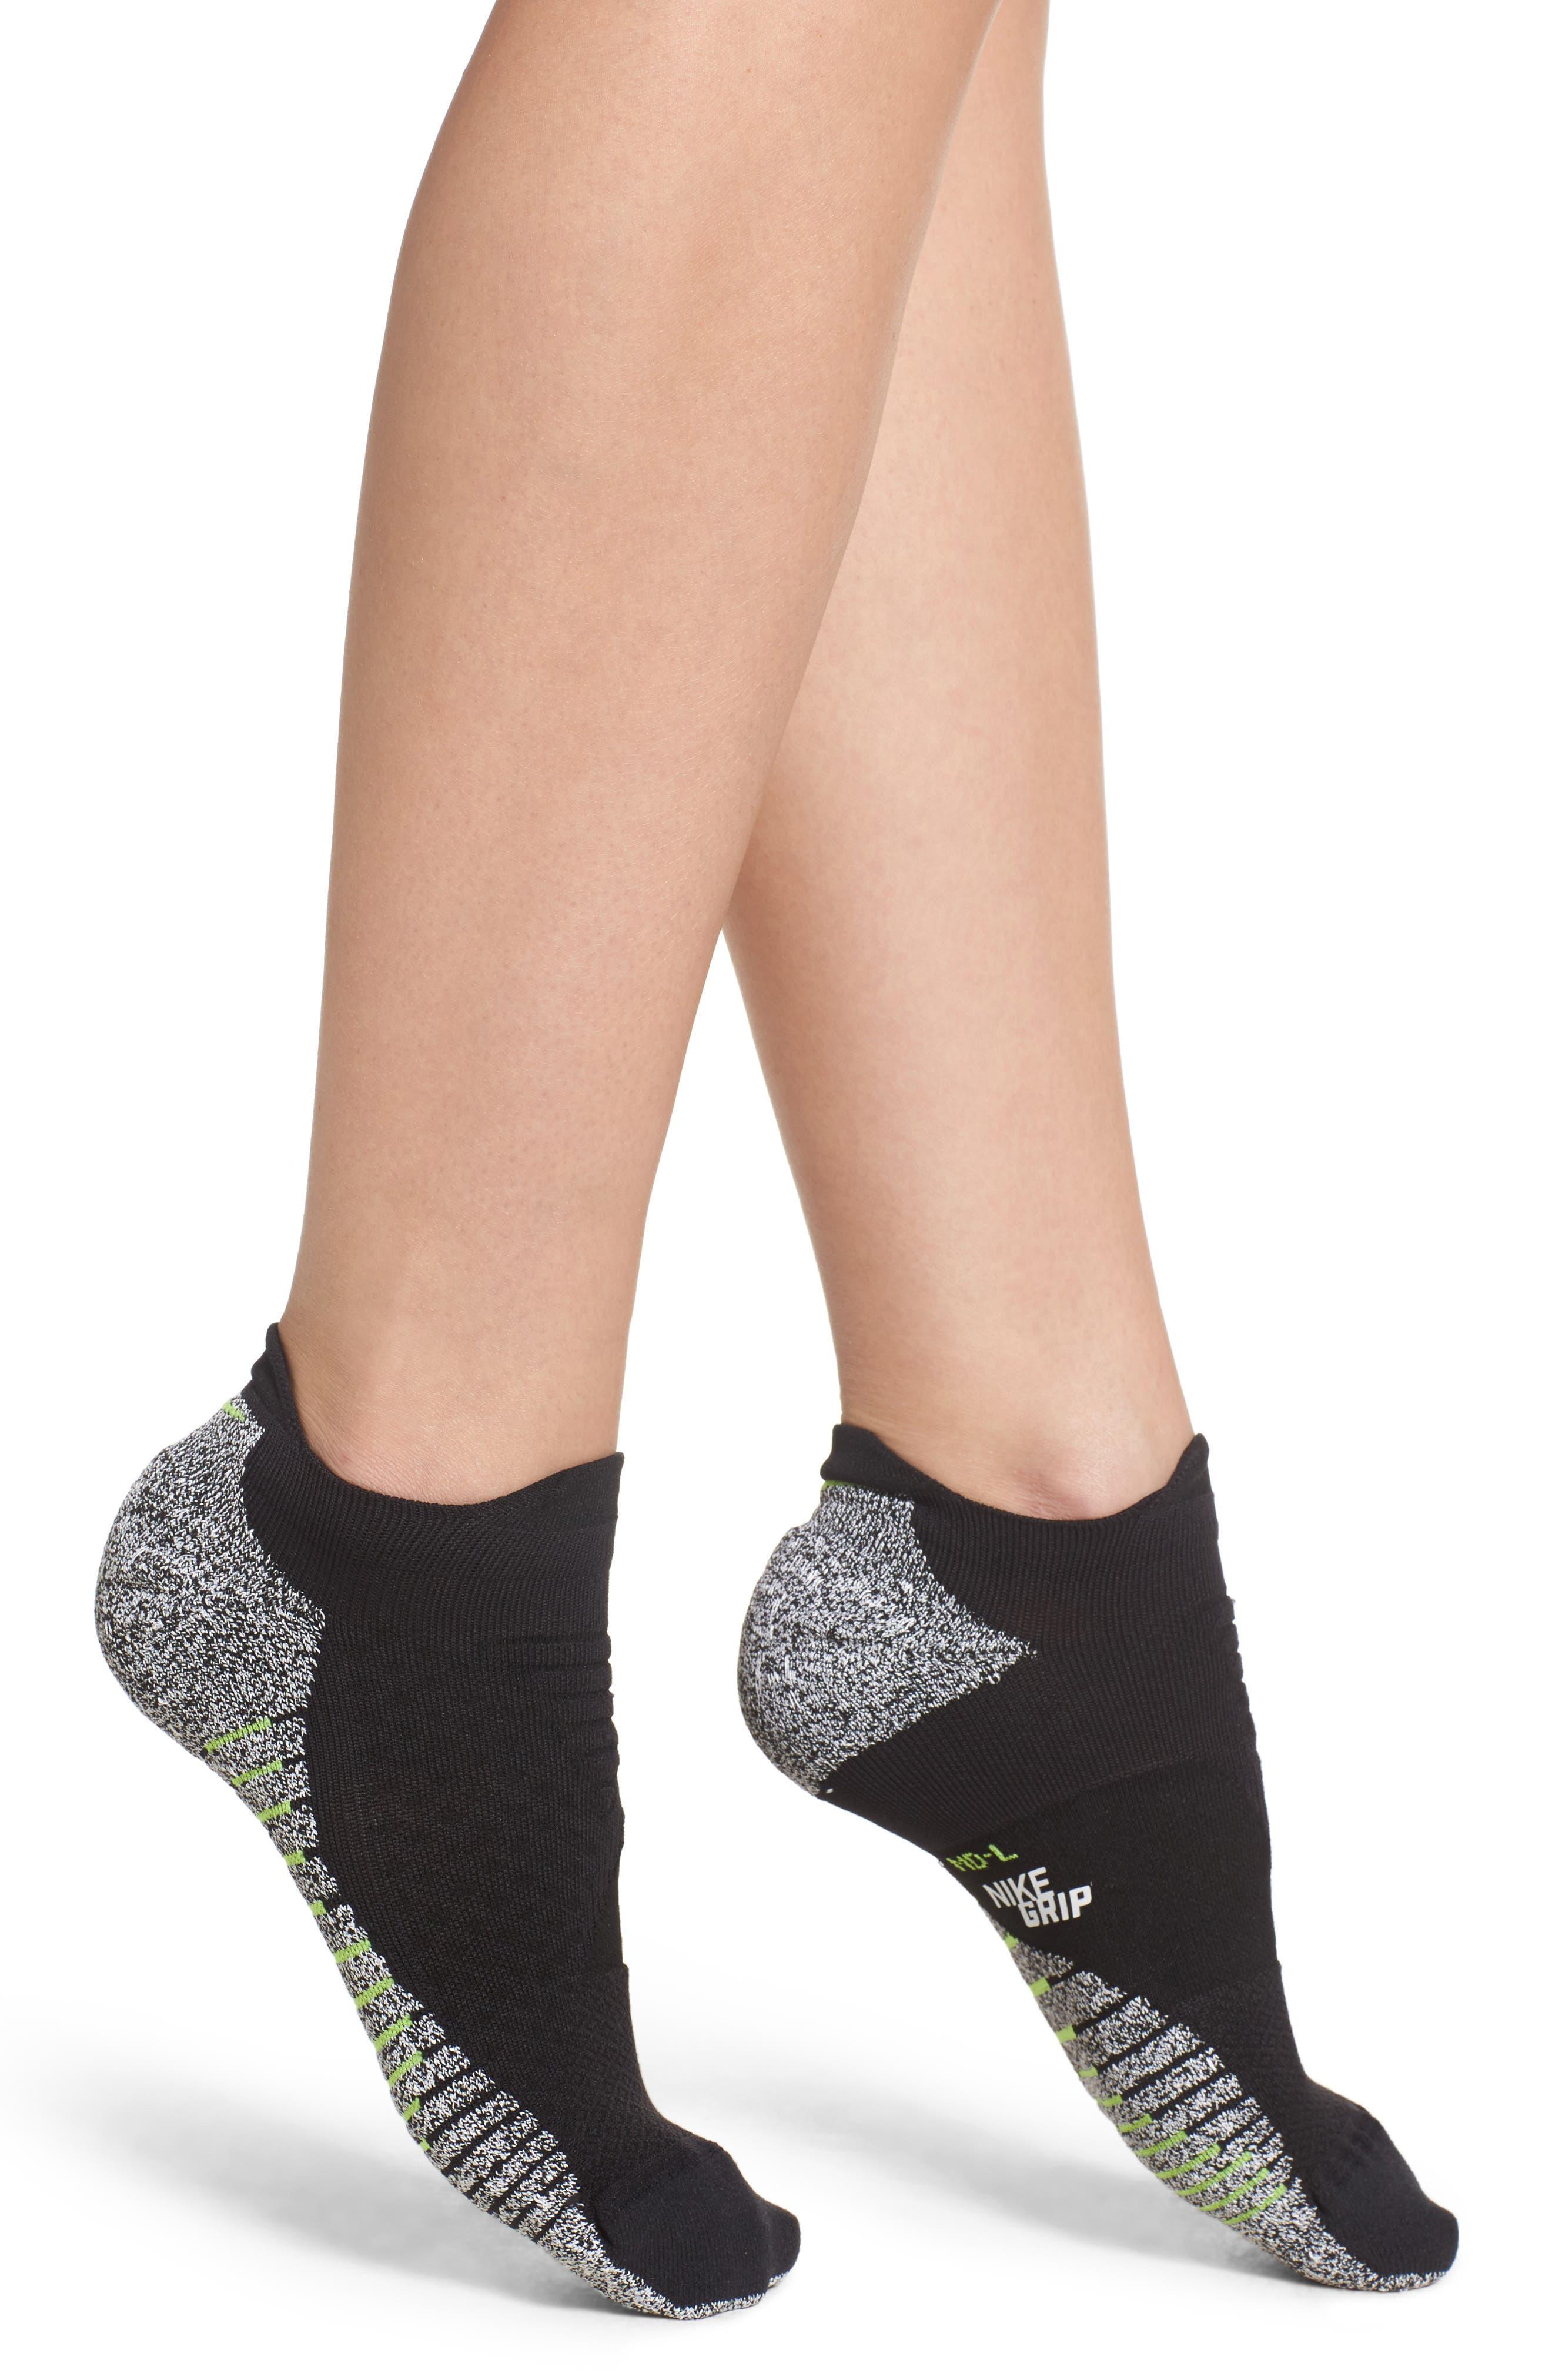 NikeGrip Low Cut Socks,                             Main thumbnail 1, color,                             Black